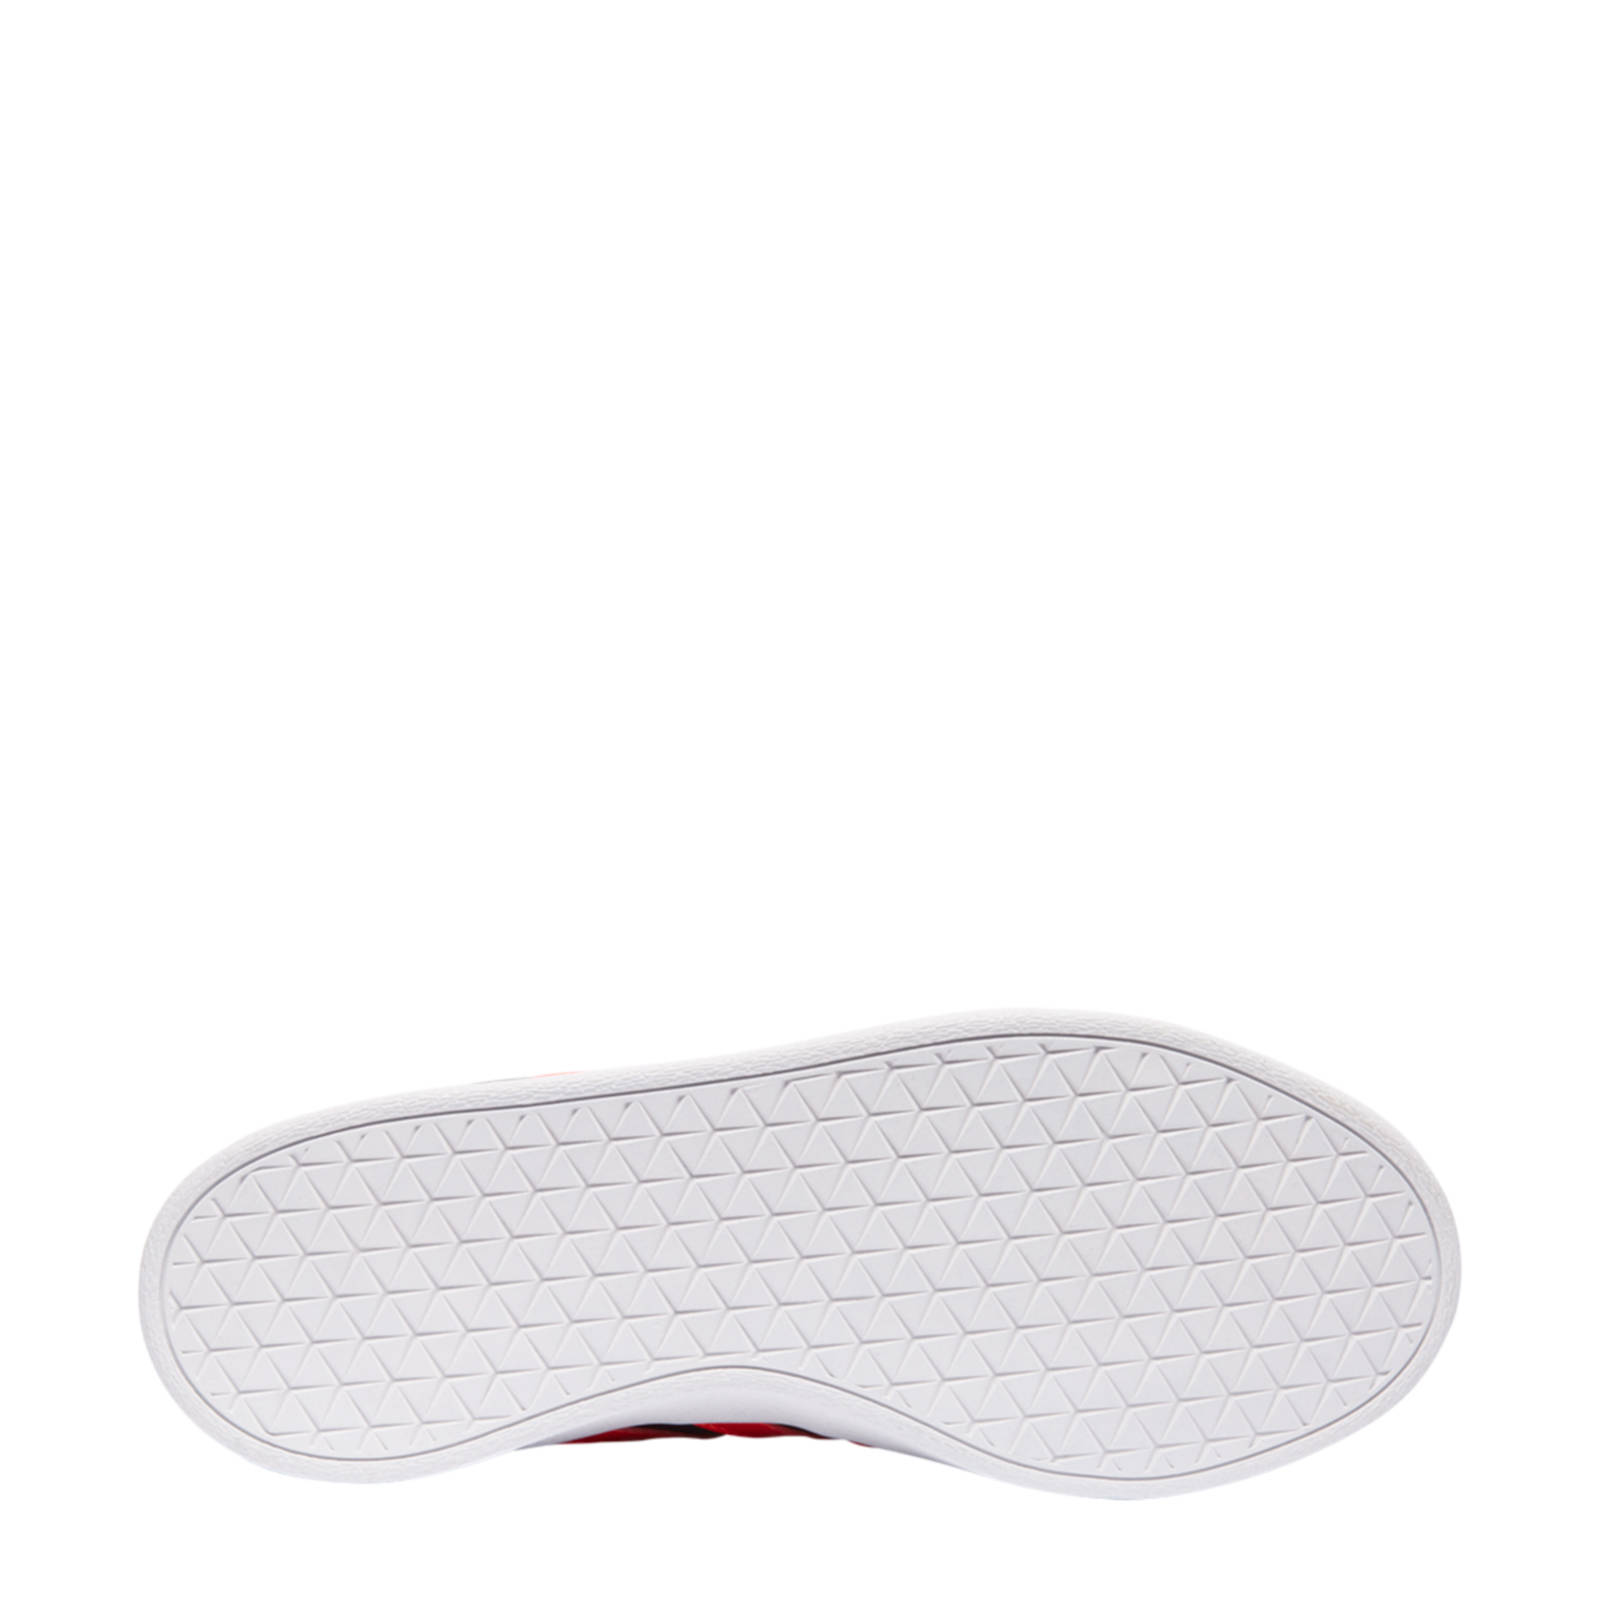 Court adidas VL grijs sneakers 2 0 qCzgwxRY